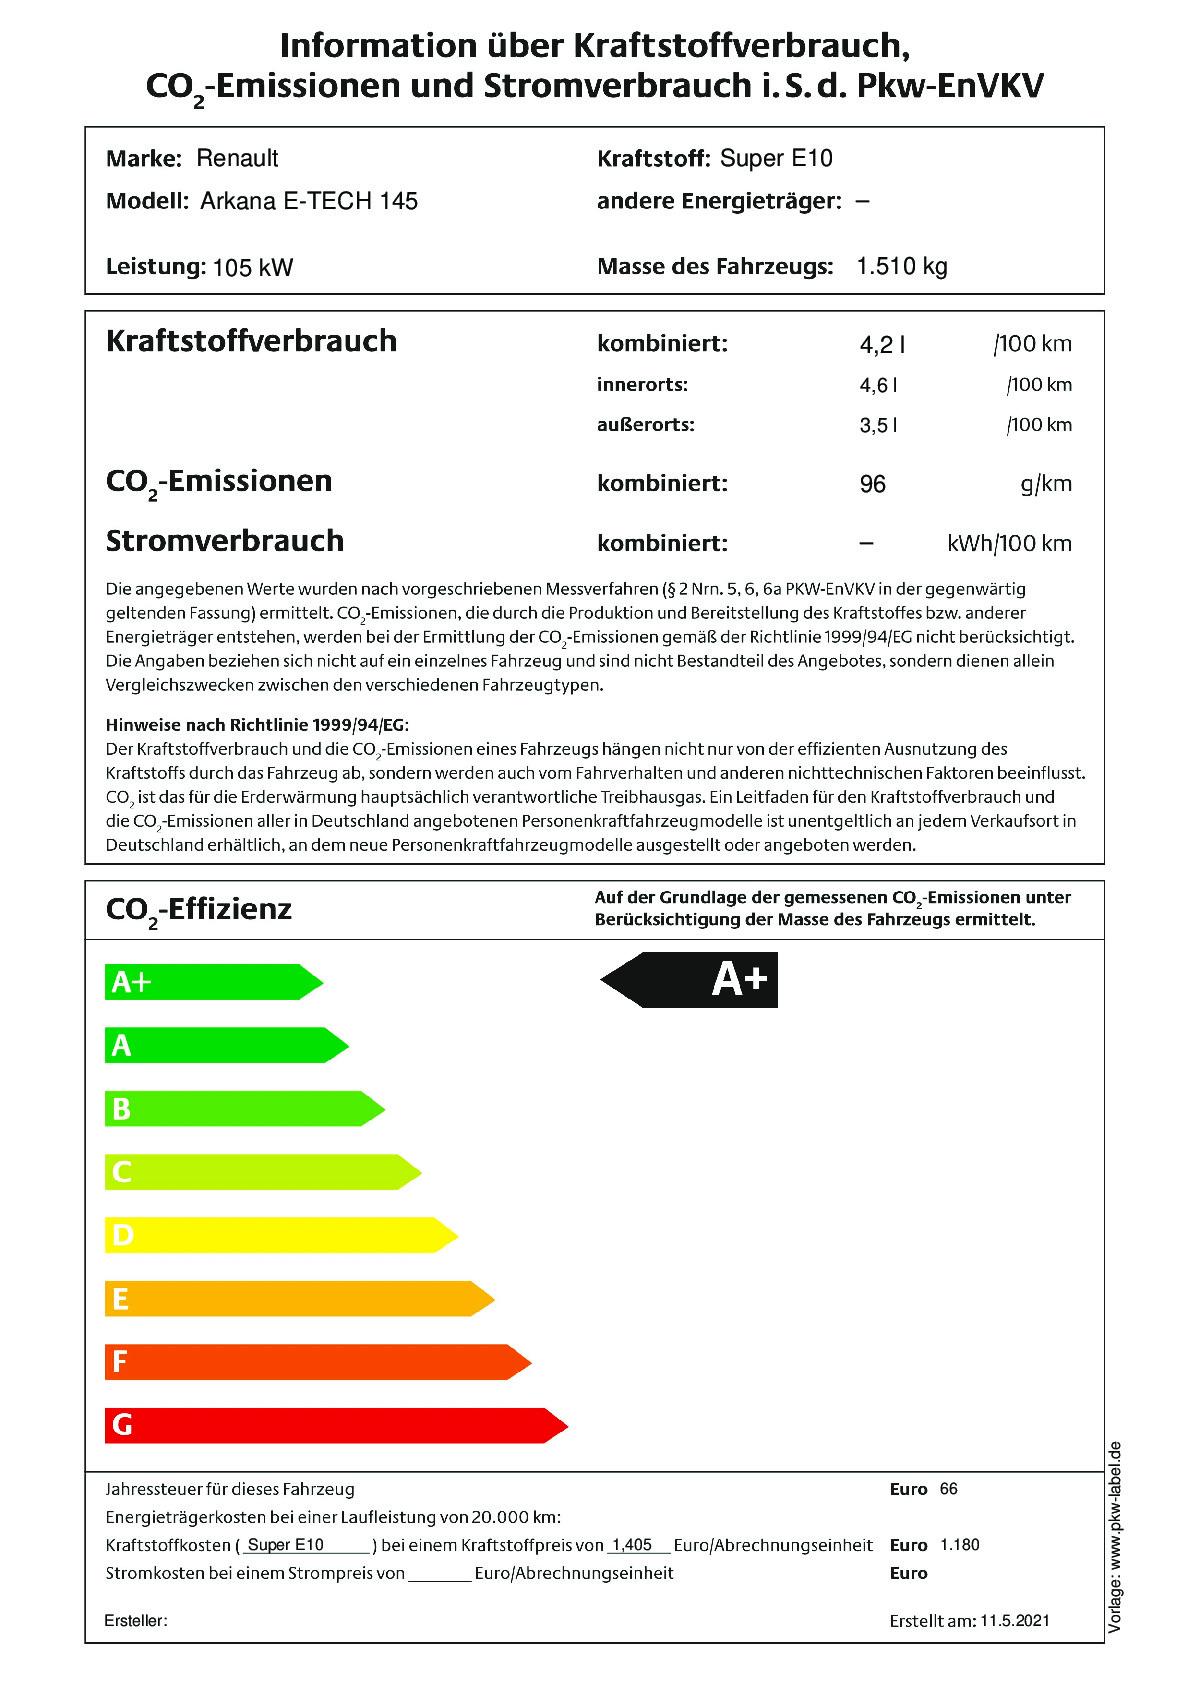 Energielabel E-TECH Hybrid 145